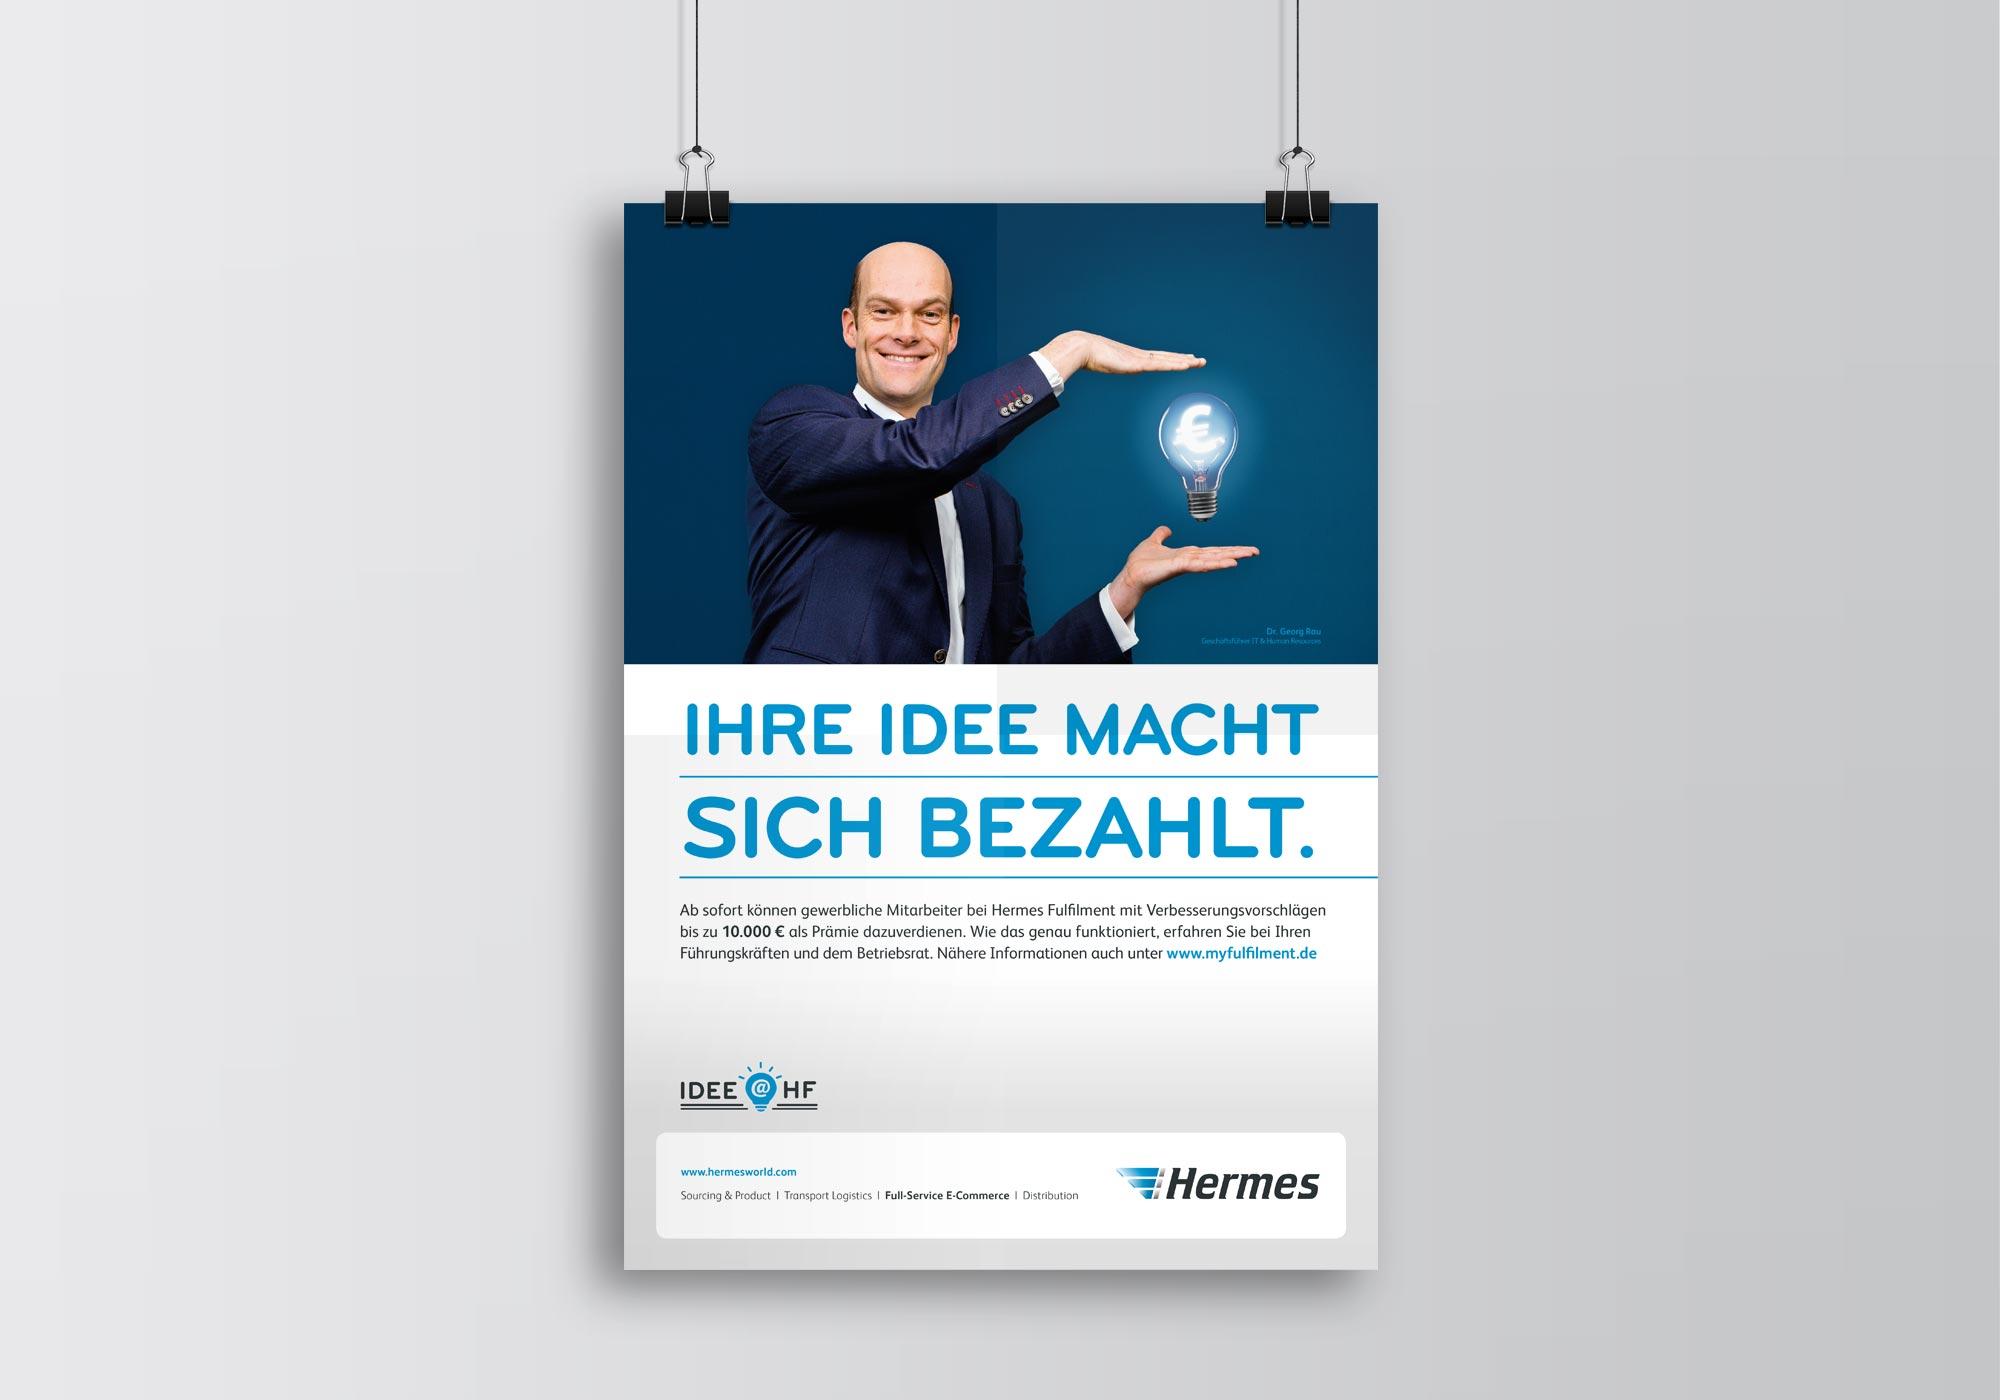 002_Idee@HF_Poster